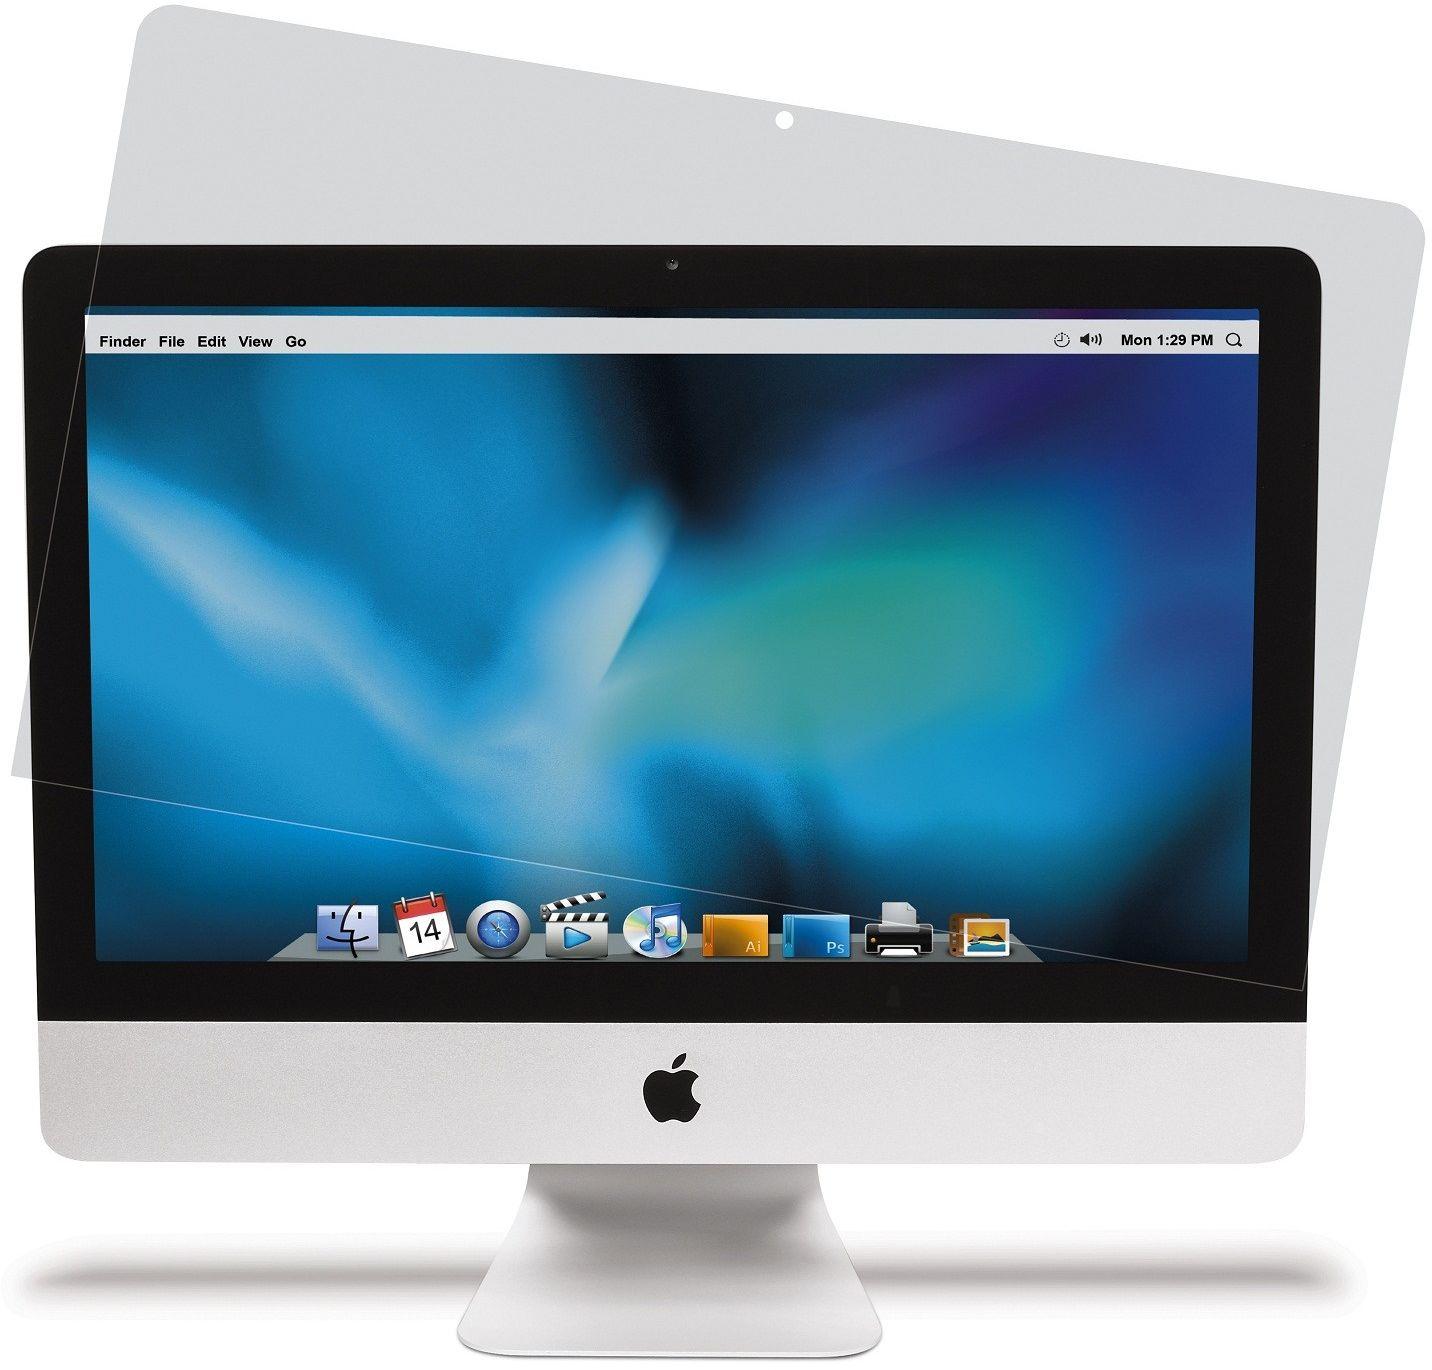 Filtr Prywatyzujący 3M  PFIM21v2 do monitora Apple  21.5'' iMac DYSTRYBUTOR 3M 98044058109